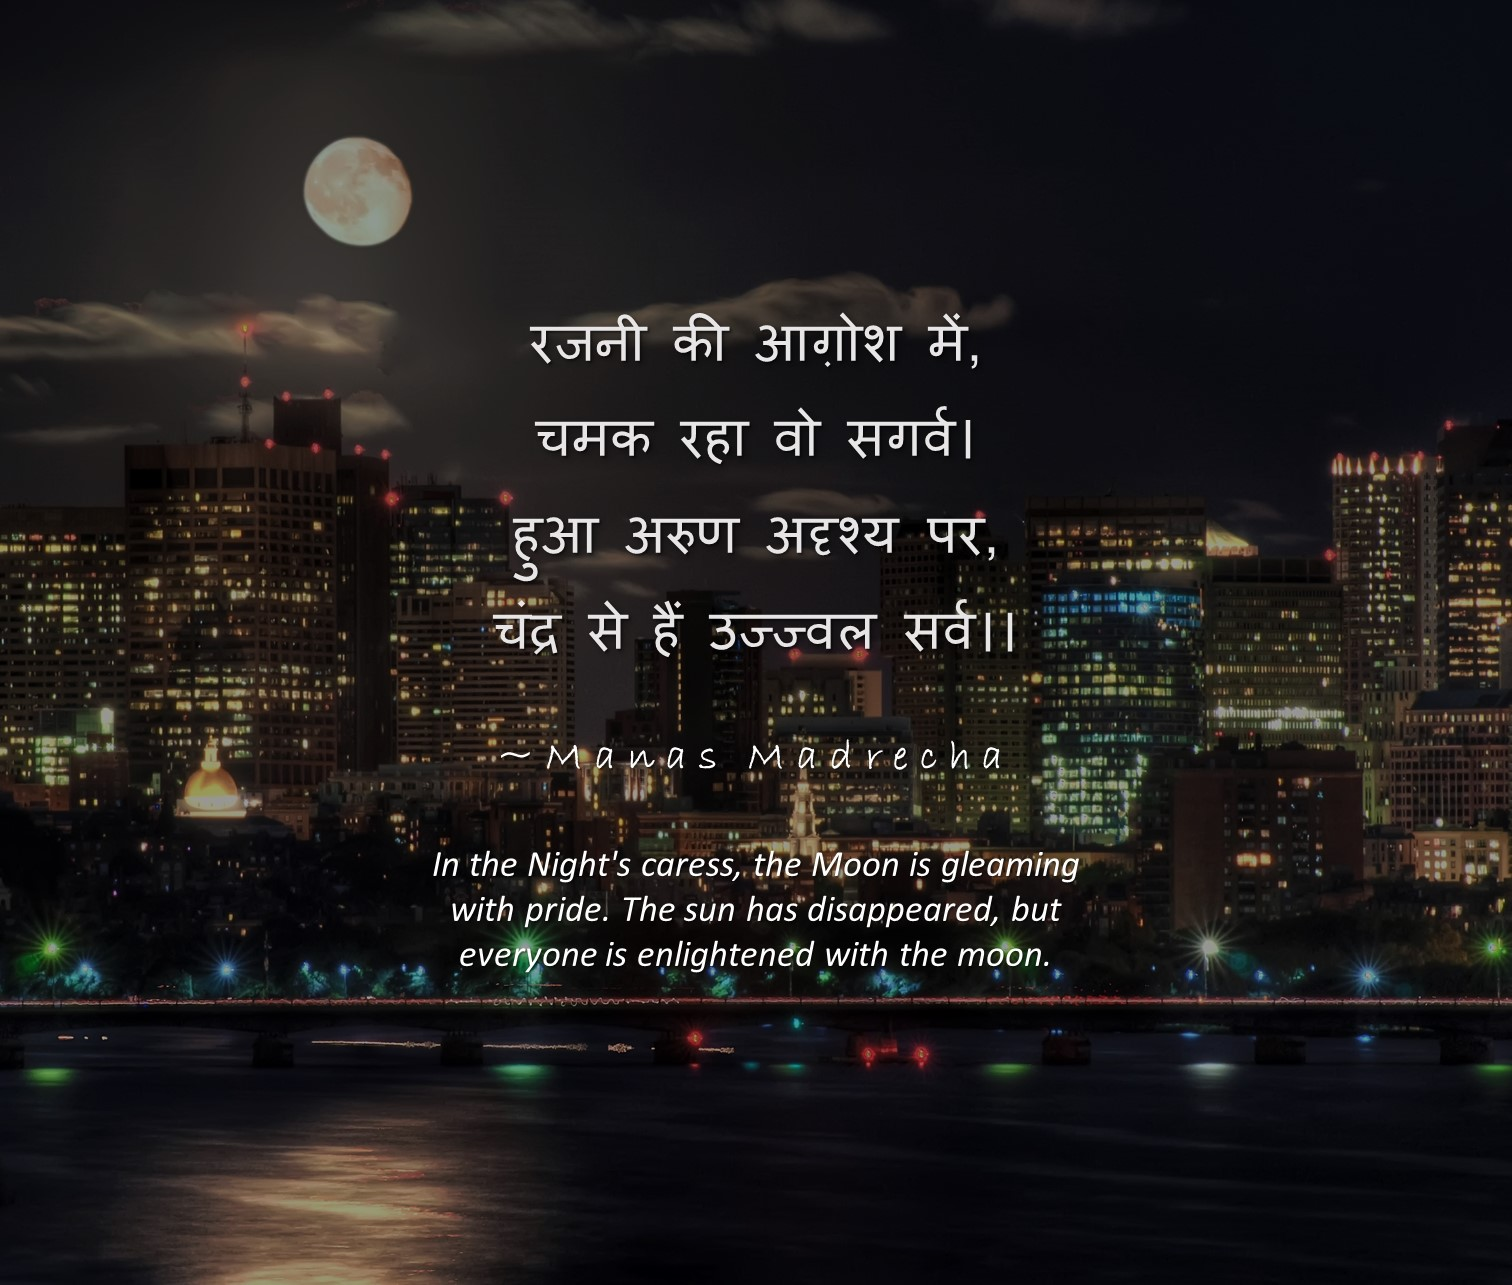 hindi poem on moon, poem on moon, moon quotes, moon sky, moon in night sky, moon over city, moonlight over city, Manas Madrecha, Manas Madrecha poems, Manas Madrecha quotes, Manas Madrecha stories, Manas Madrecha blog, simplifying universe, night city, city lights in night, full moon in night